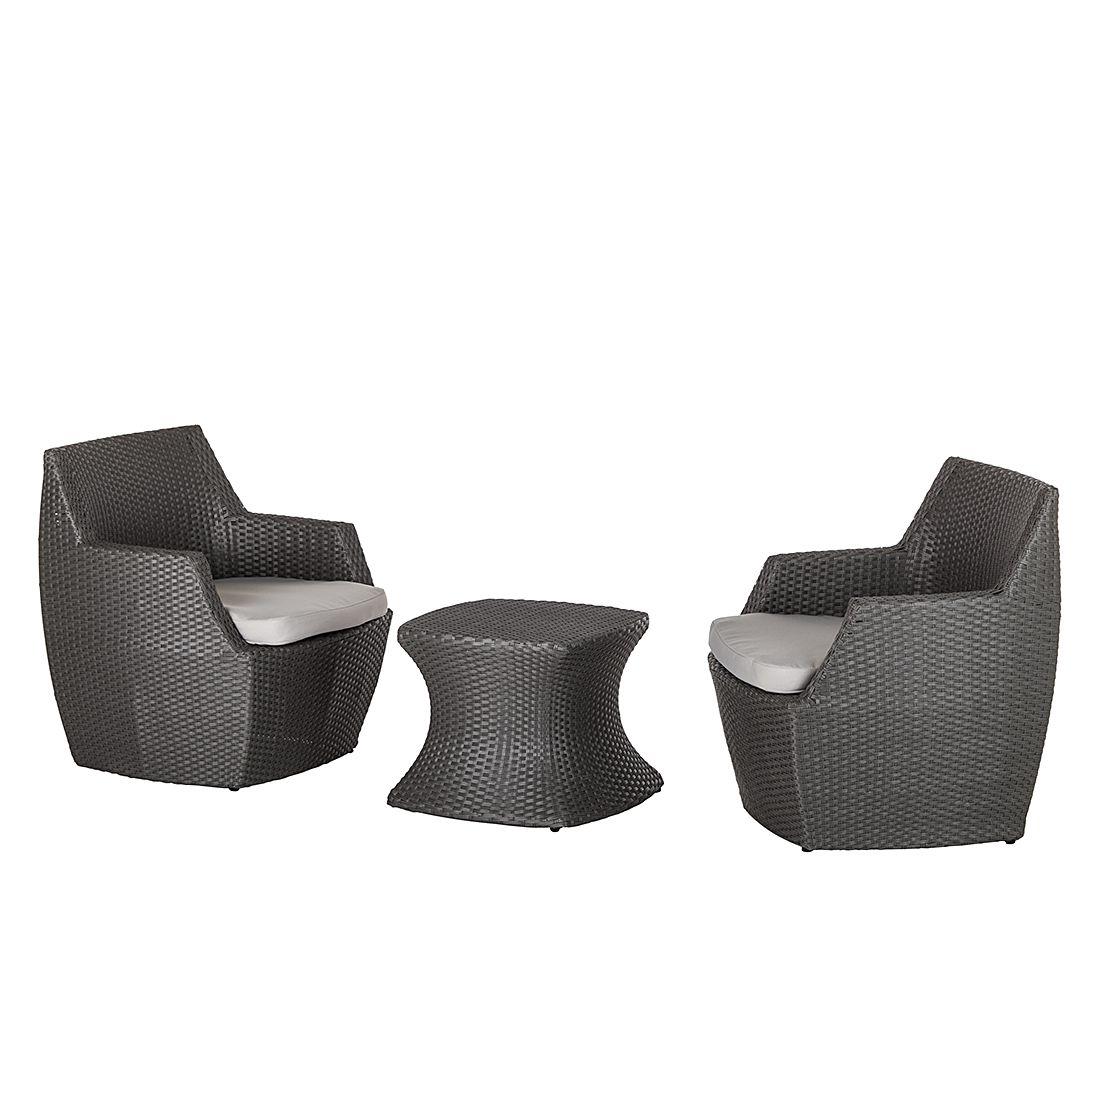 31 sparen sitzgruppe paradise lounge 3 teilig von fredriks nur 329 99 cherry m bel. Black Bedroom Furniture Sets. Home Design Ideas